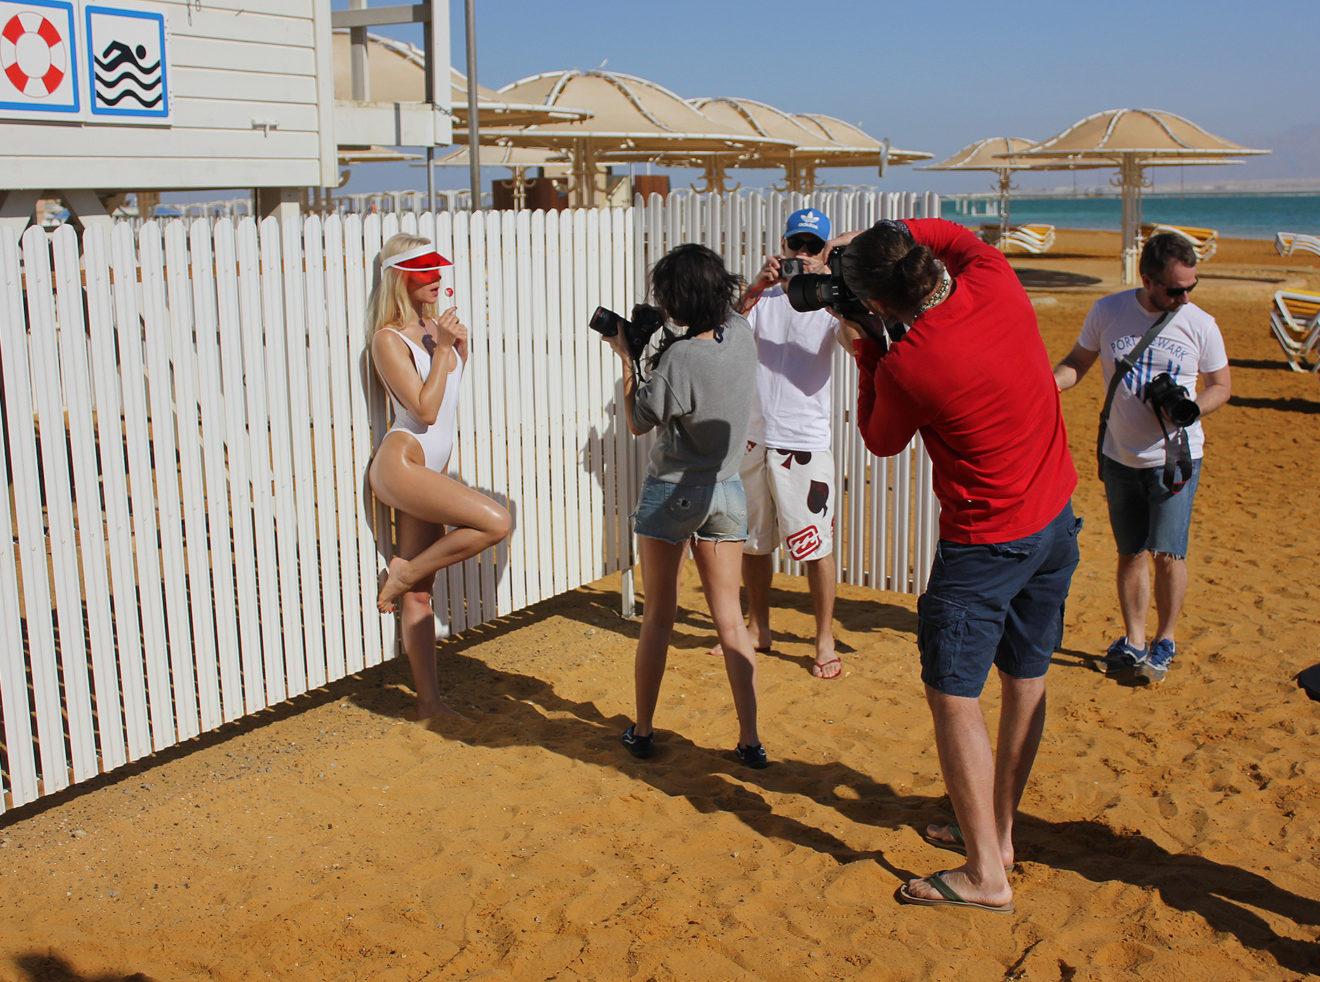 Ana Dias shooting for Playboy